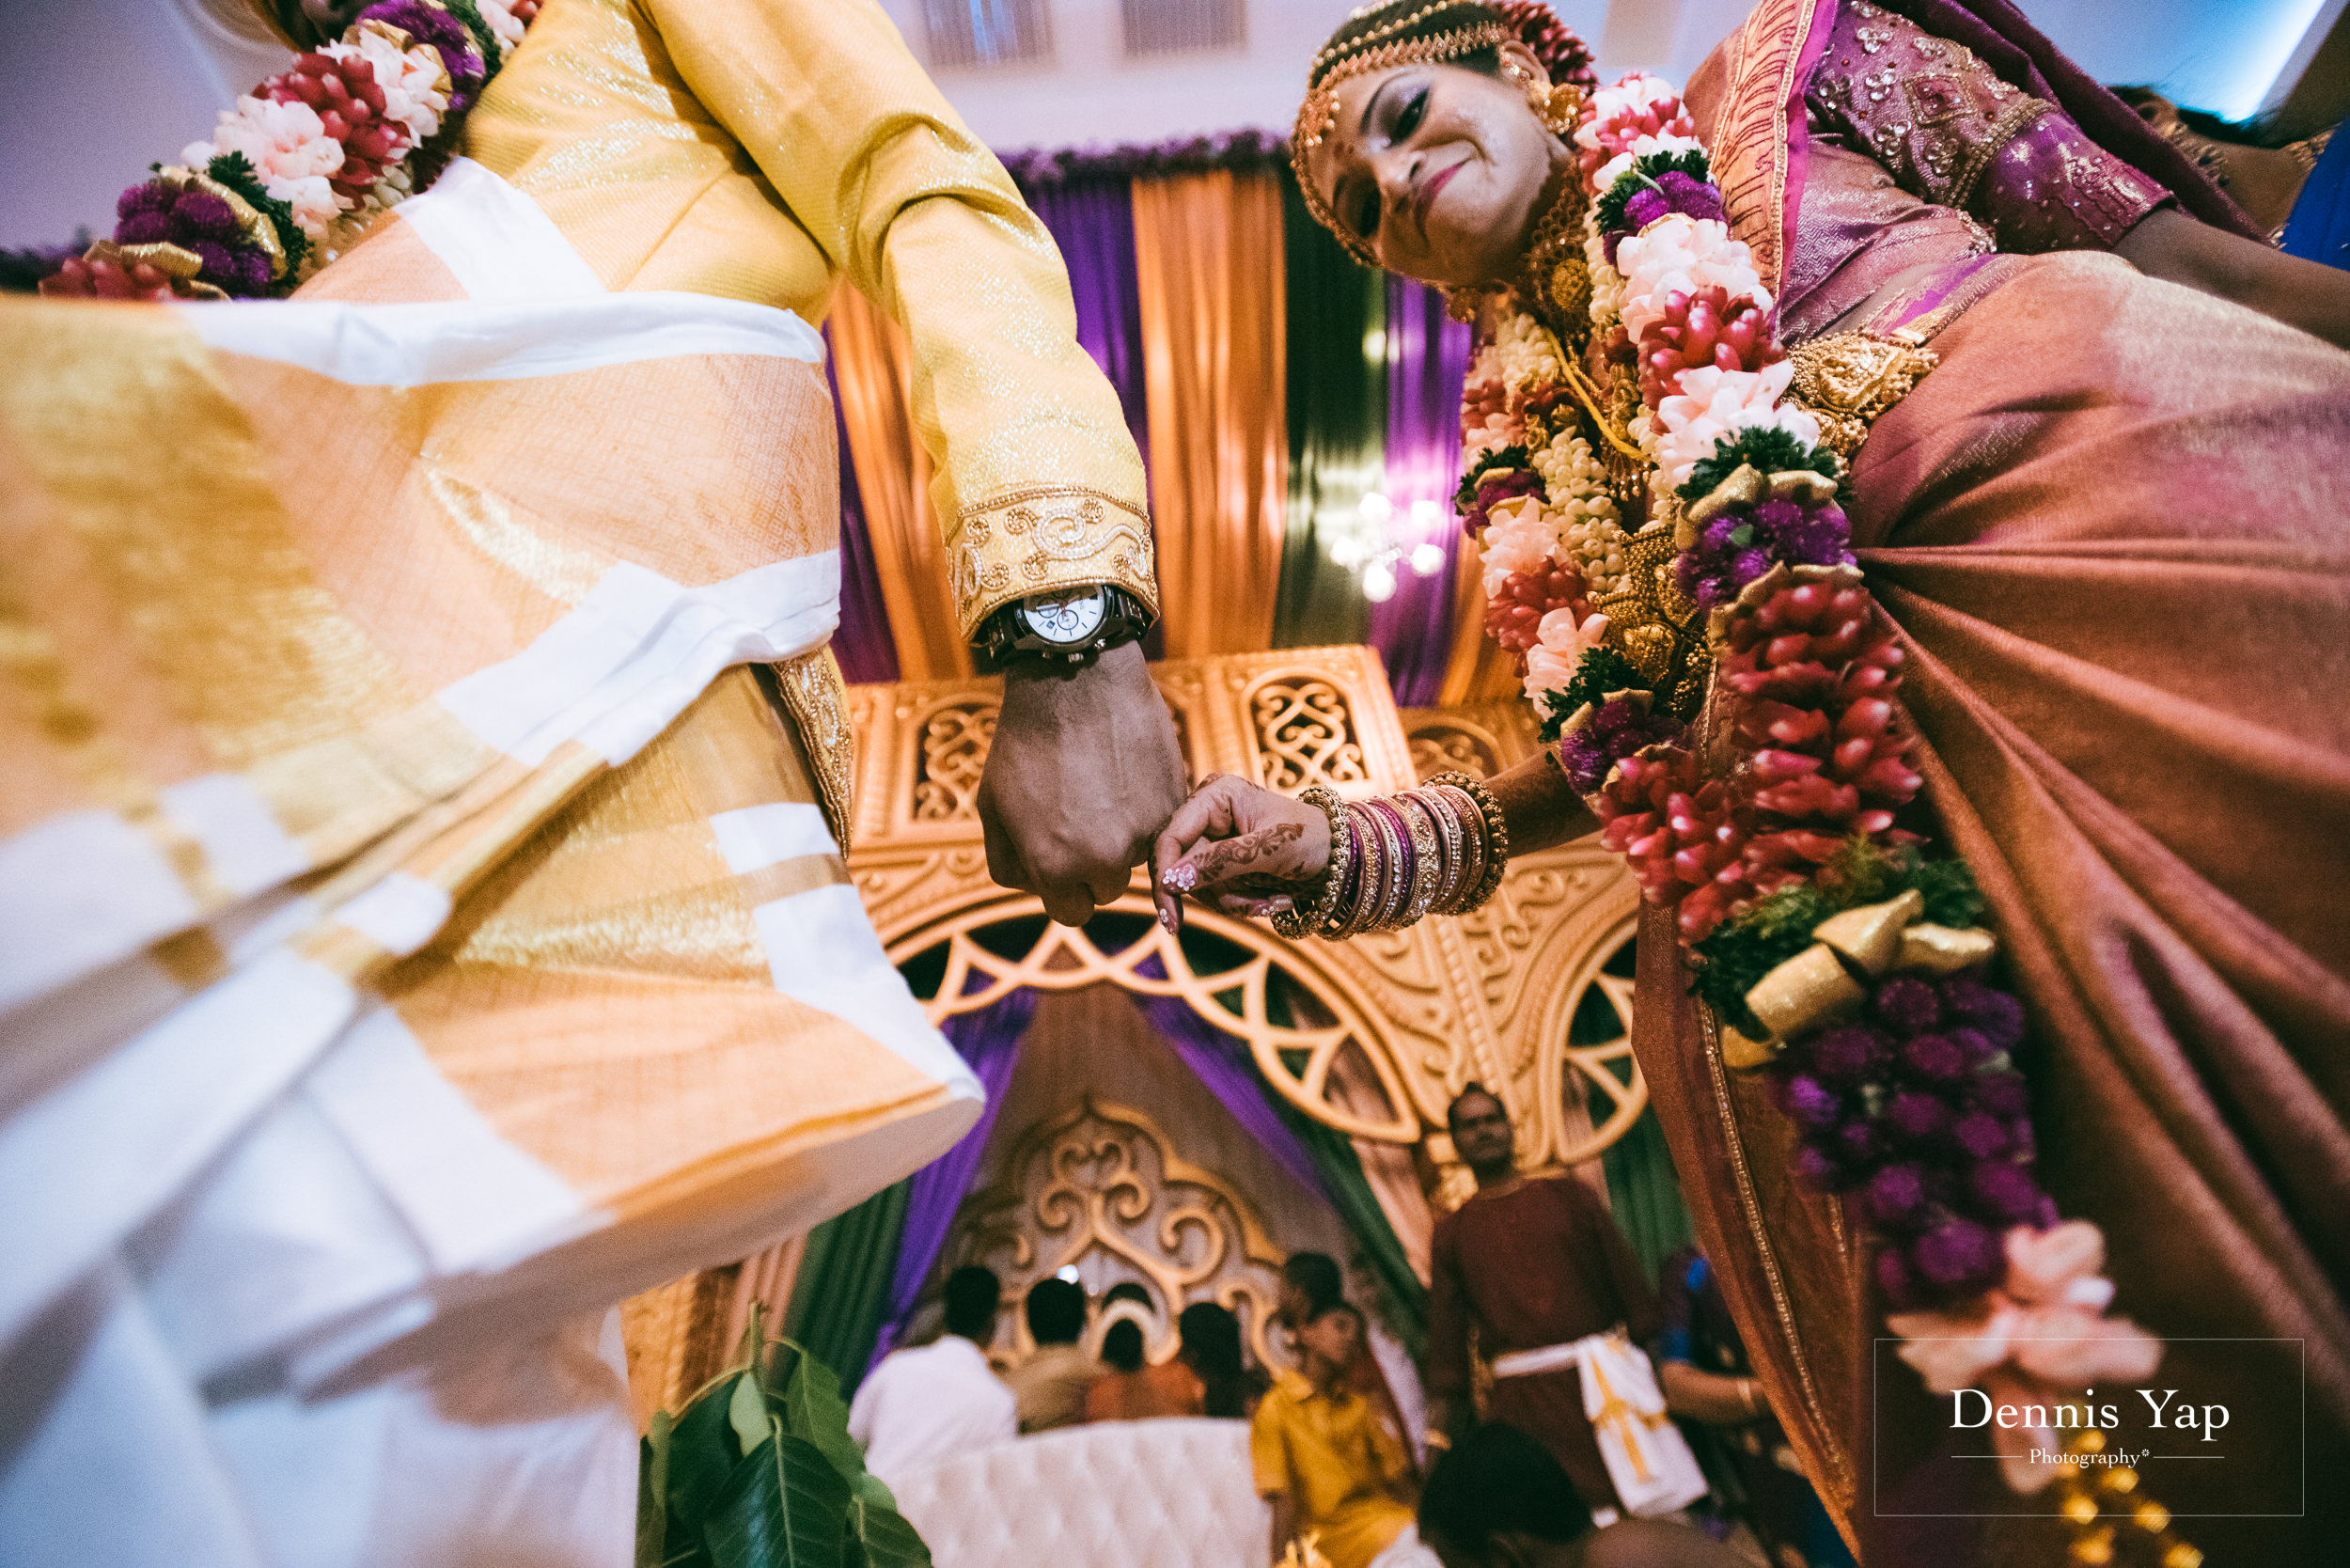 puvaneswaran cangitaa indian wedding ceremony ideal convention dennis yap photography malaysia-27.jpg